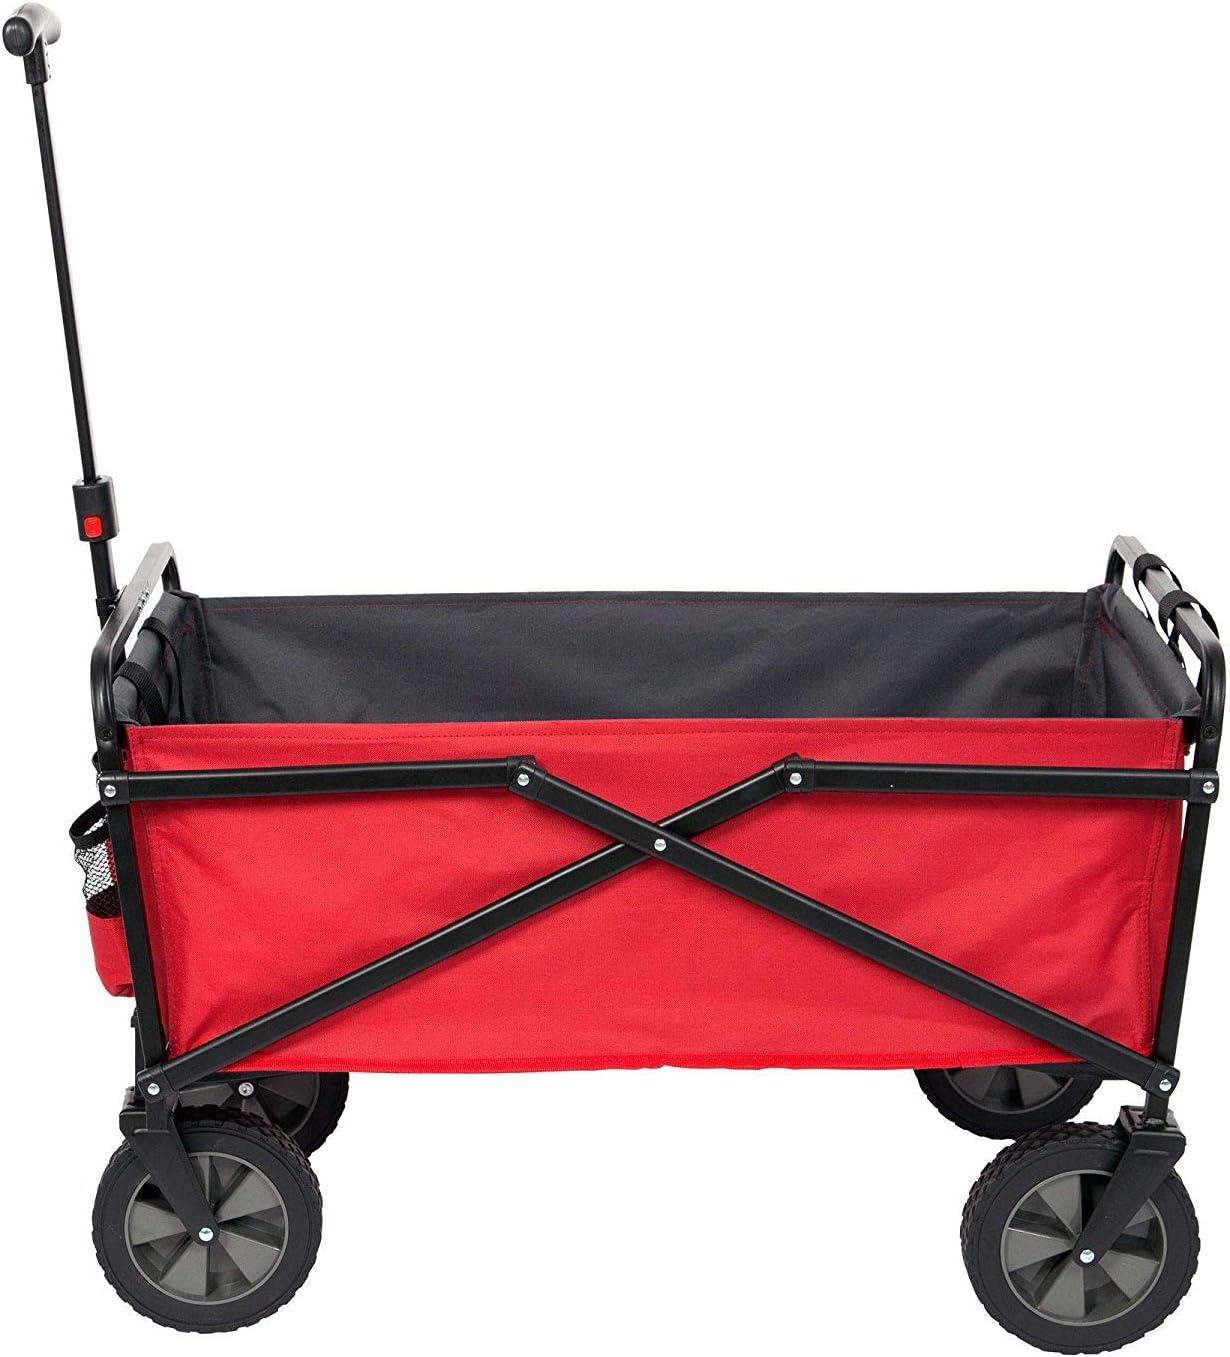 Seina 150 Pound Capacity Portable Folding Steel Wagon - Best Collapsible Wagon